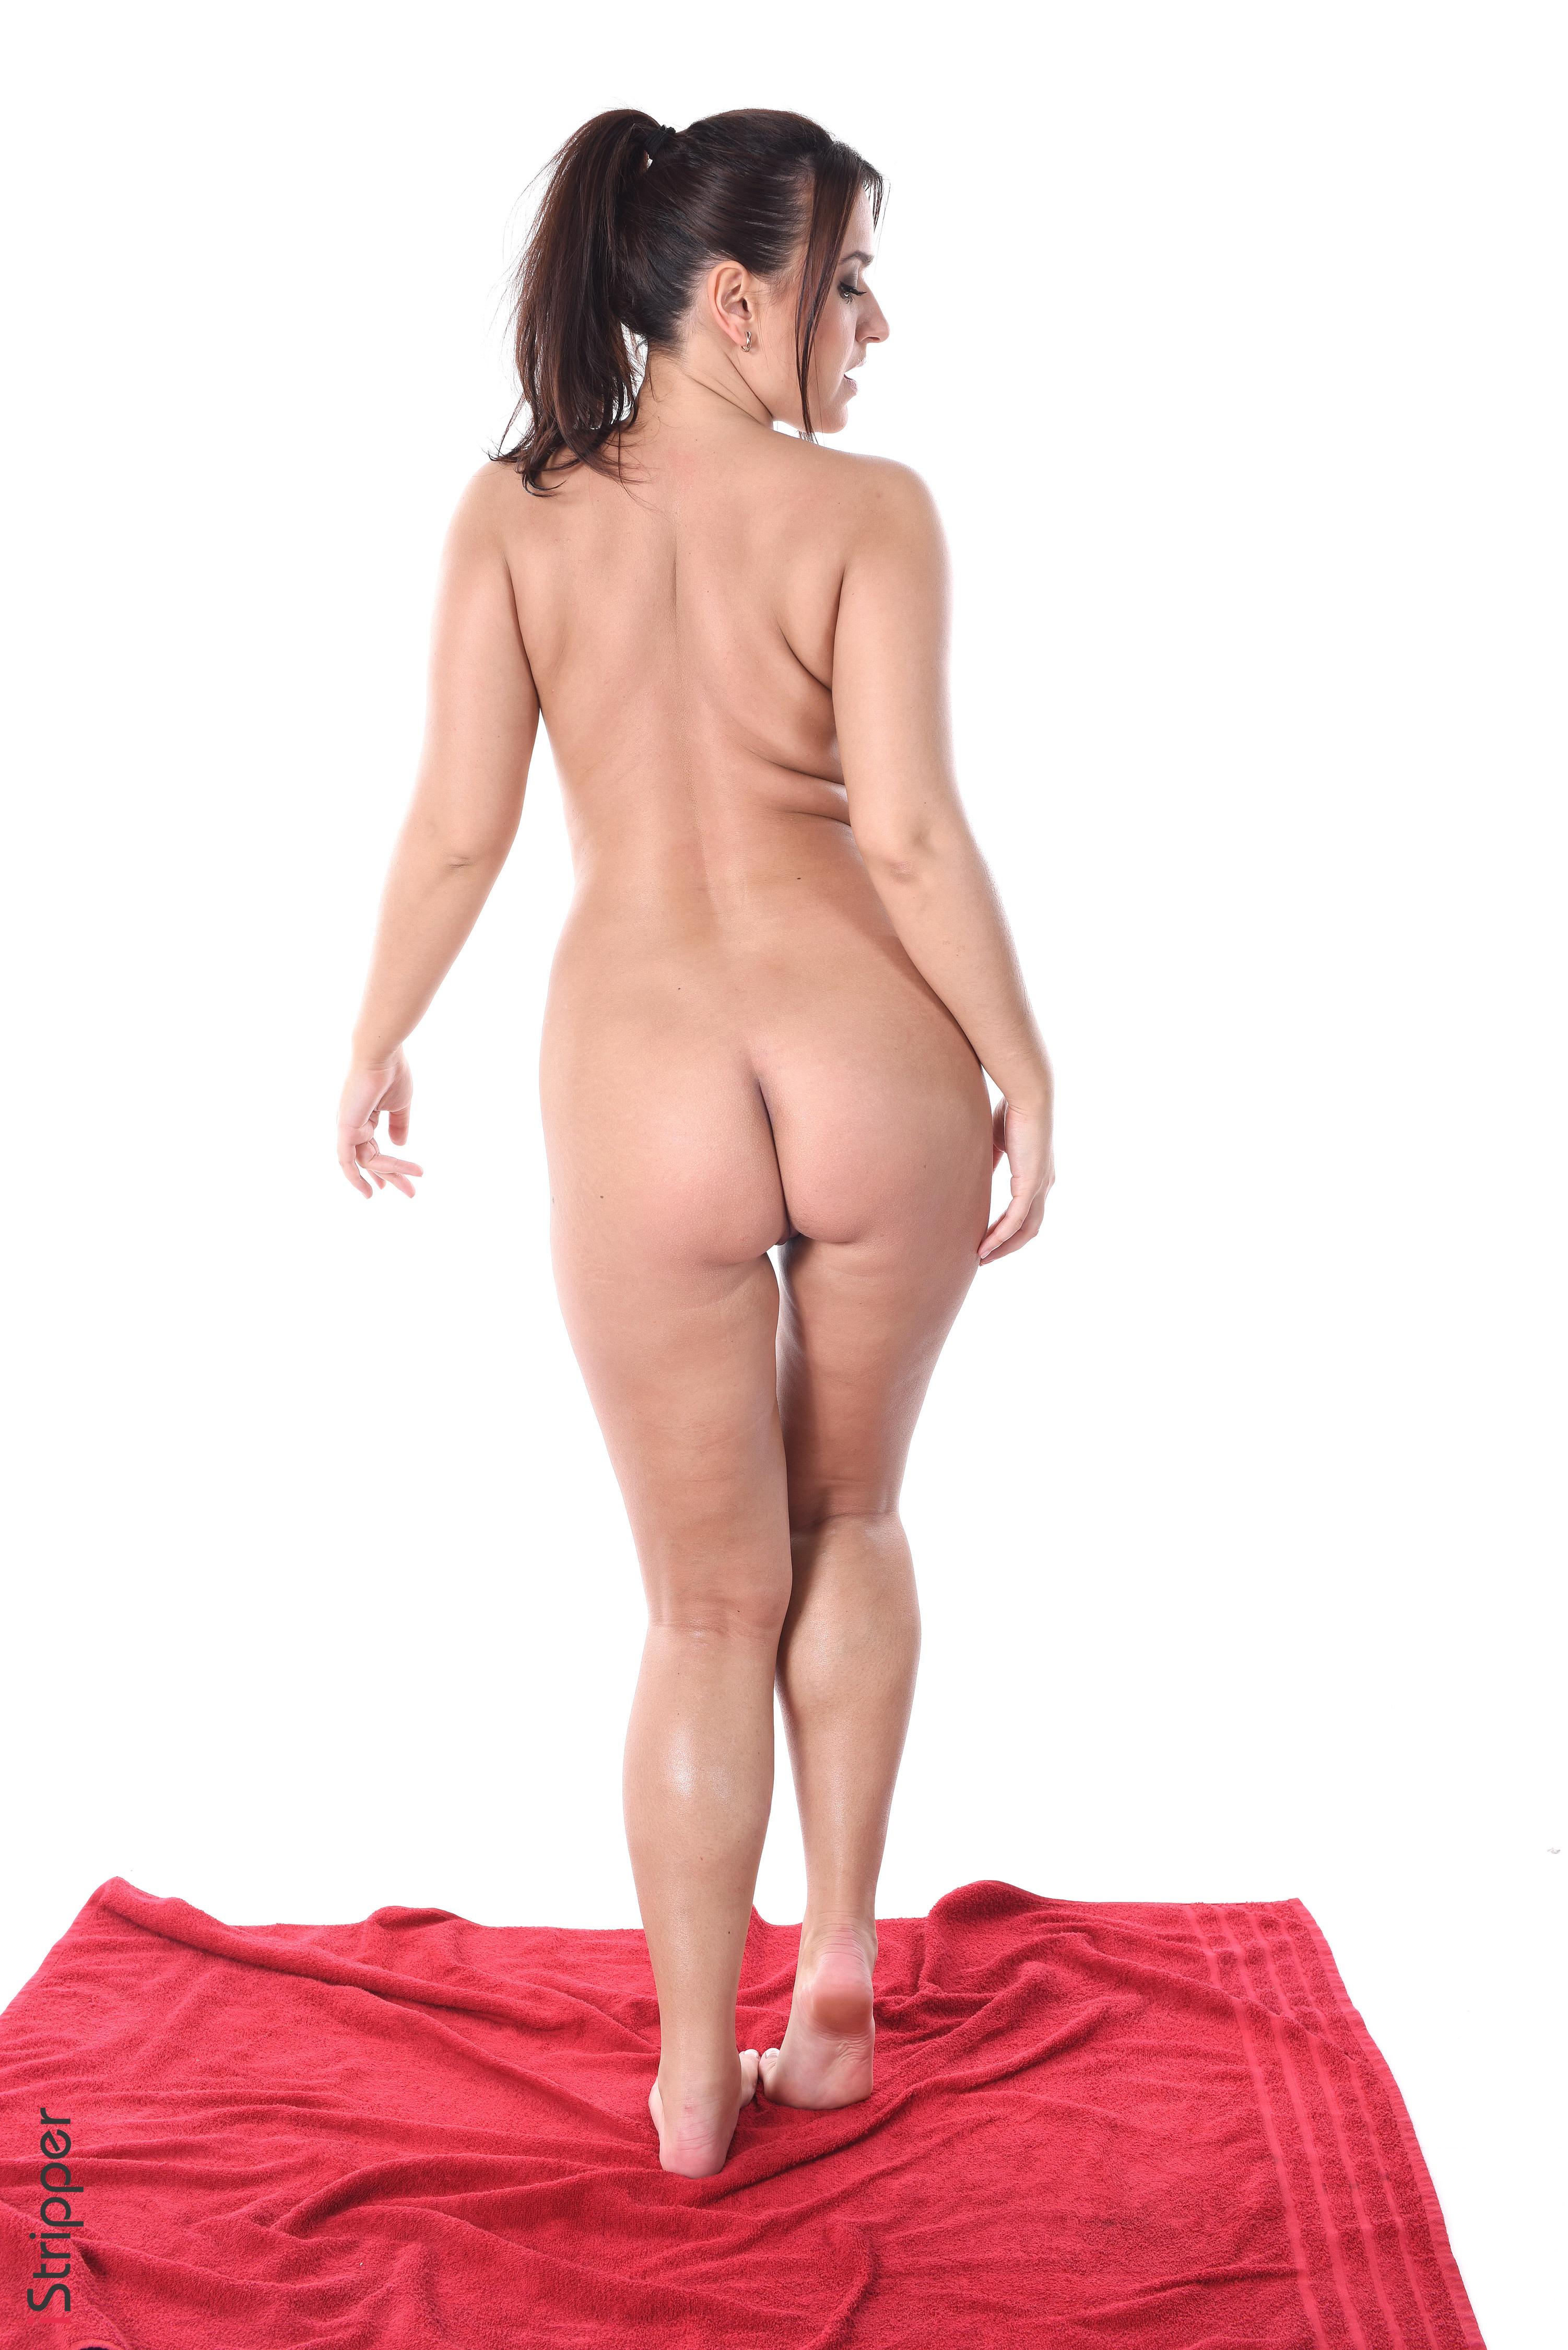 nude pc wallpaper